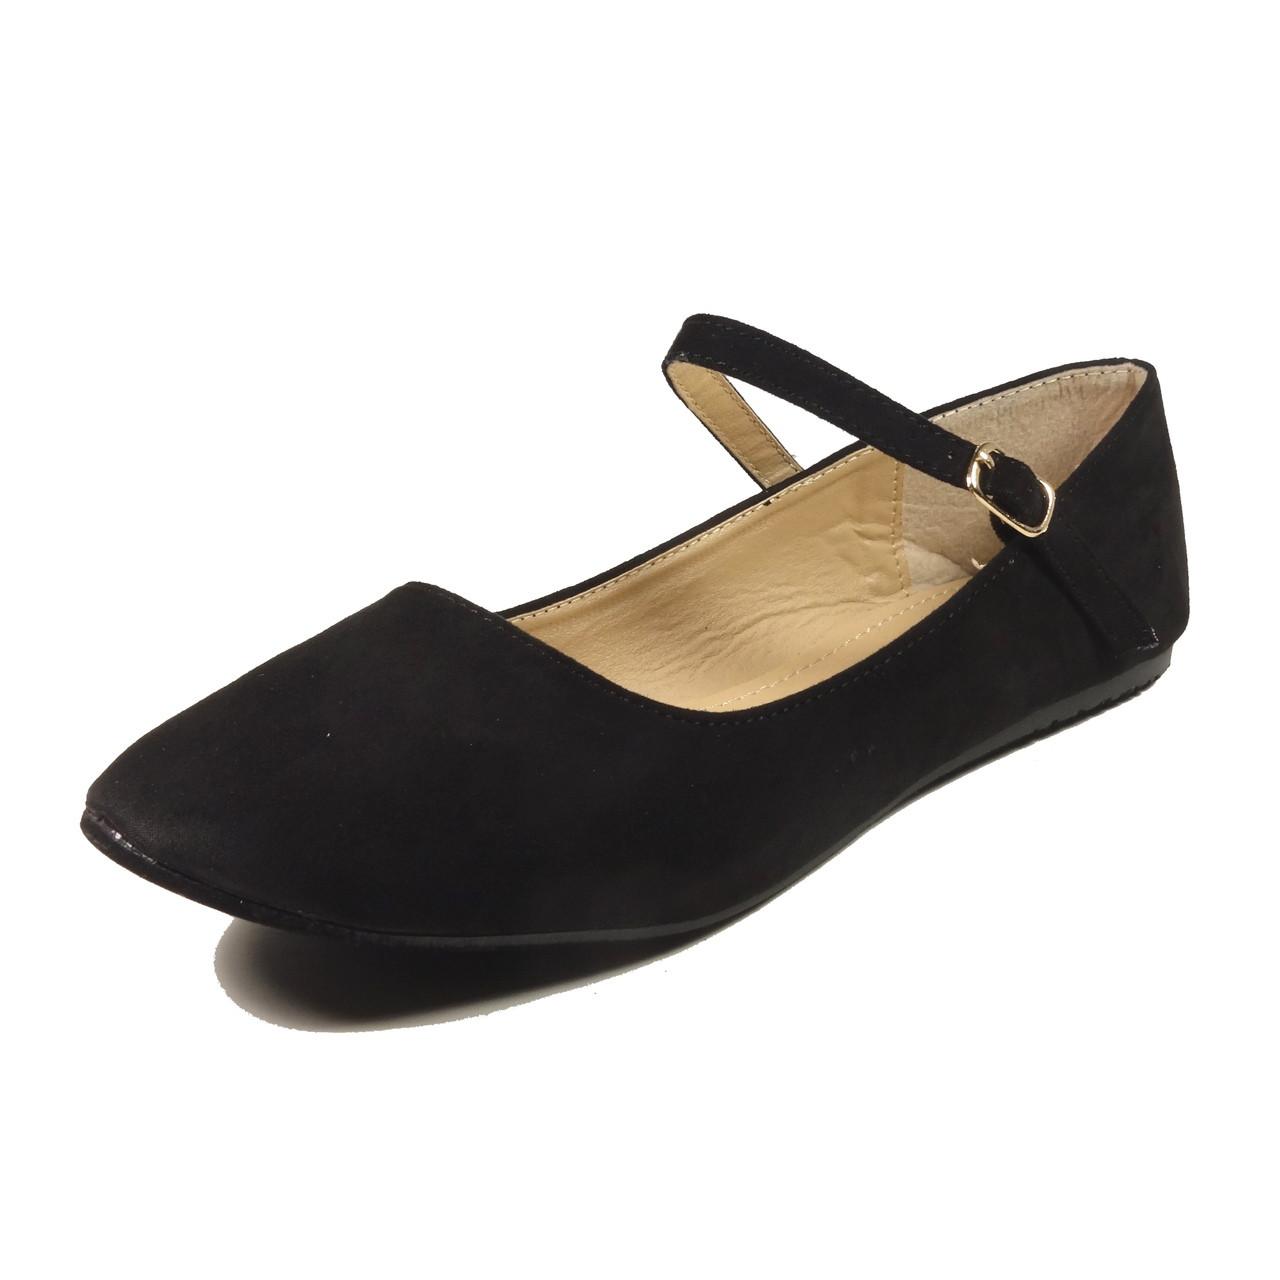 Nova Utopia Women s Mary Jane Flats - NFLA01 Black Suede - Nova Footwear